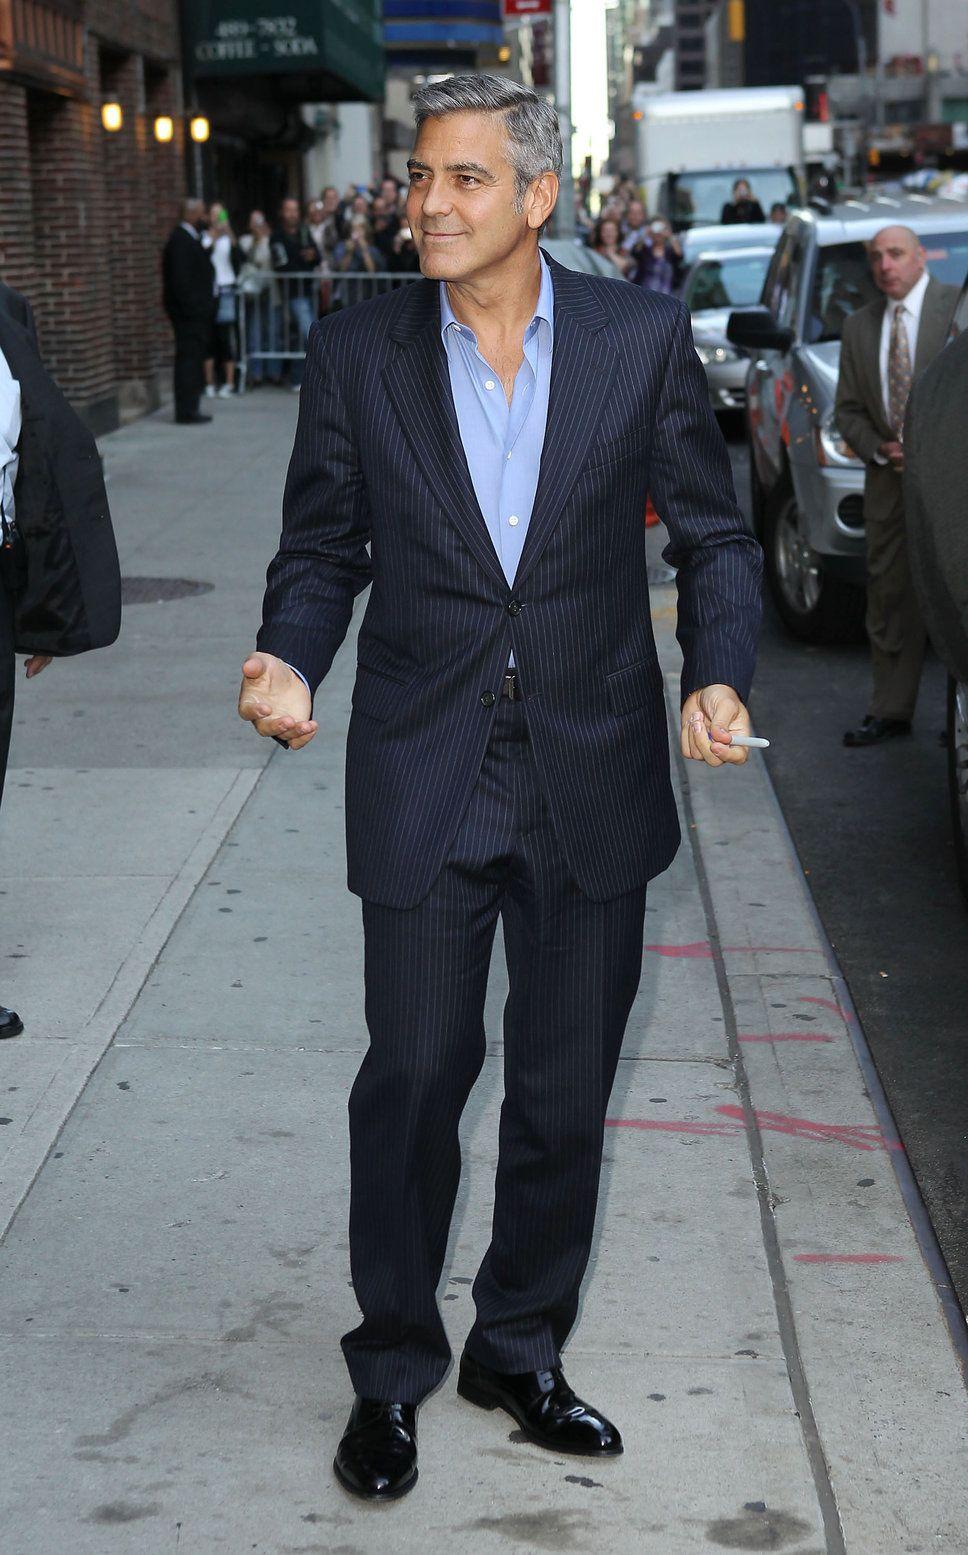 George Clooney navy pinstripe suit light blue shirt, no tie | Look ...